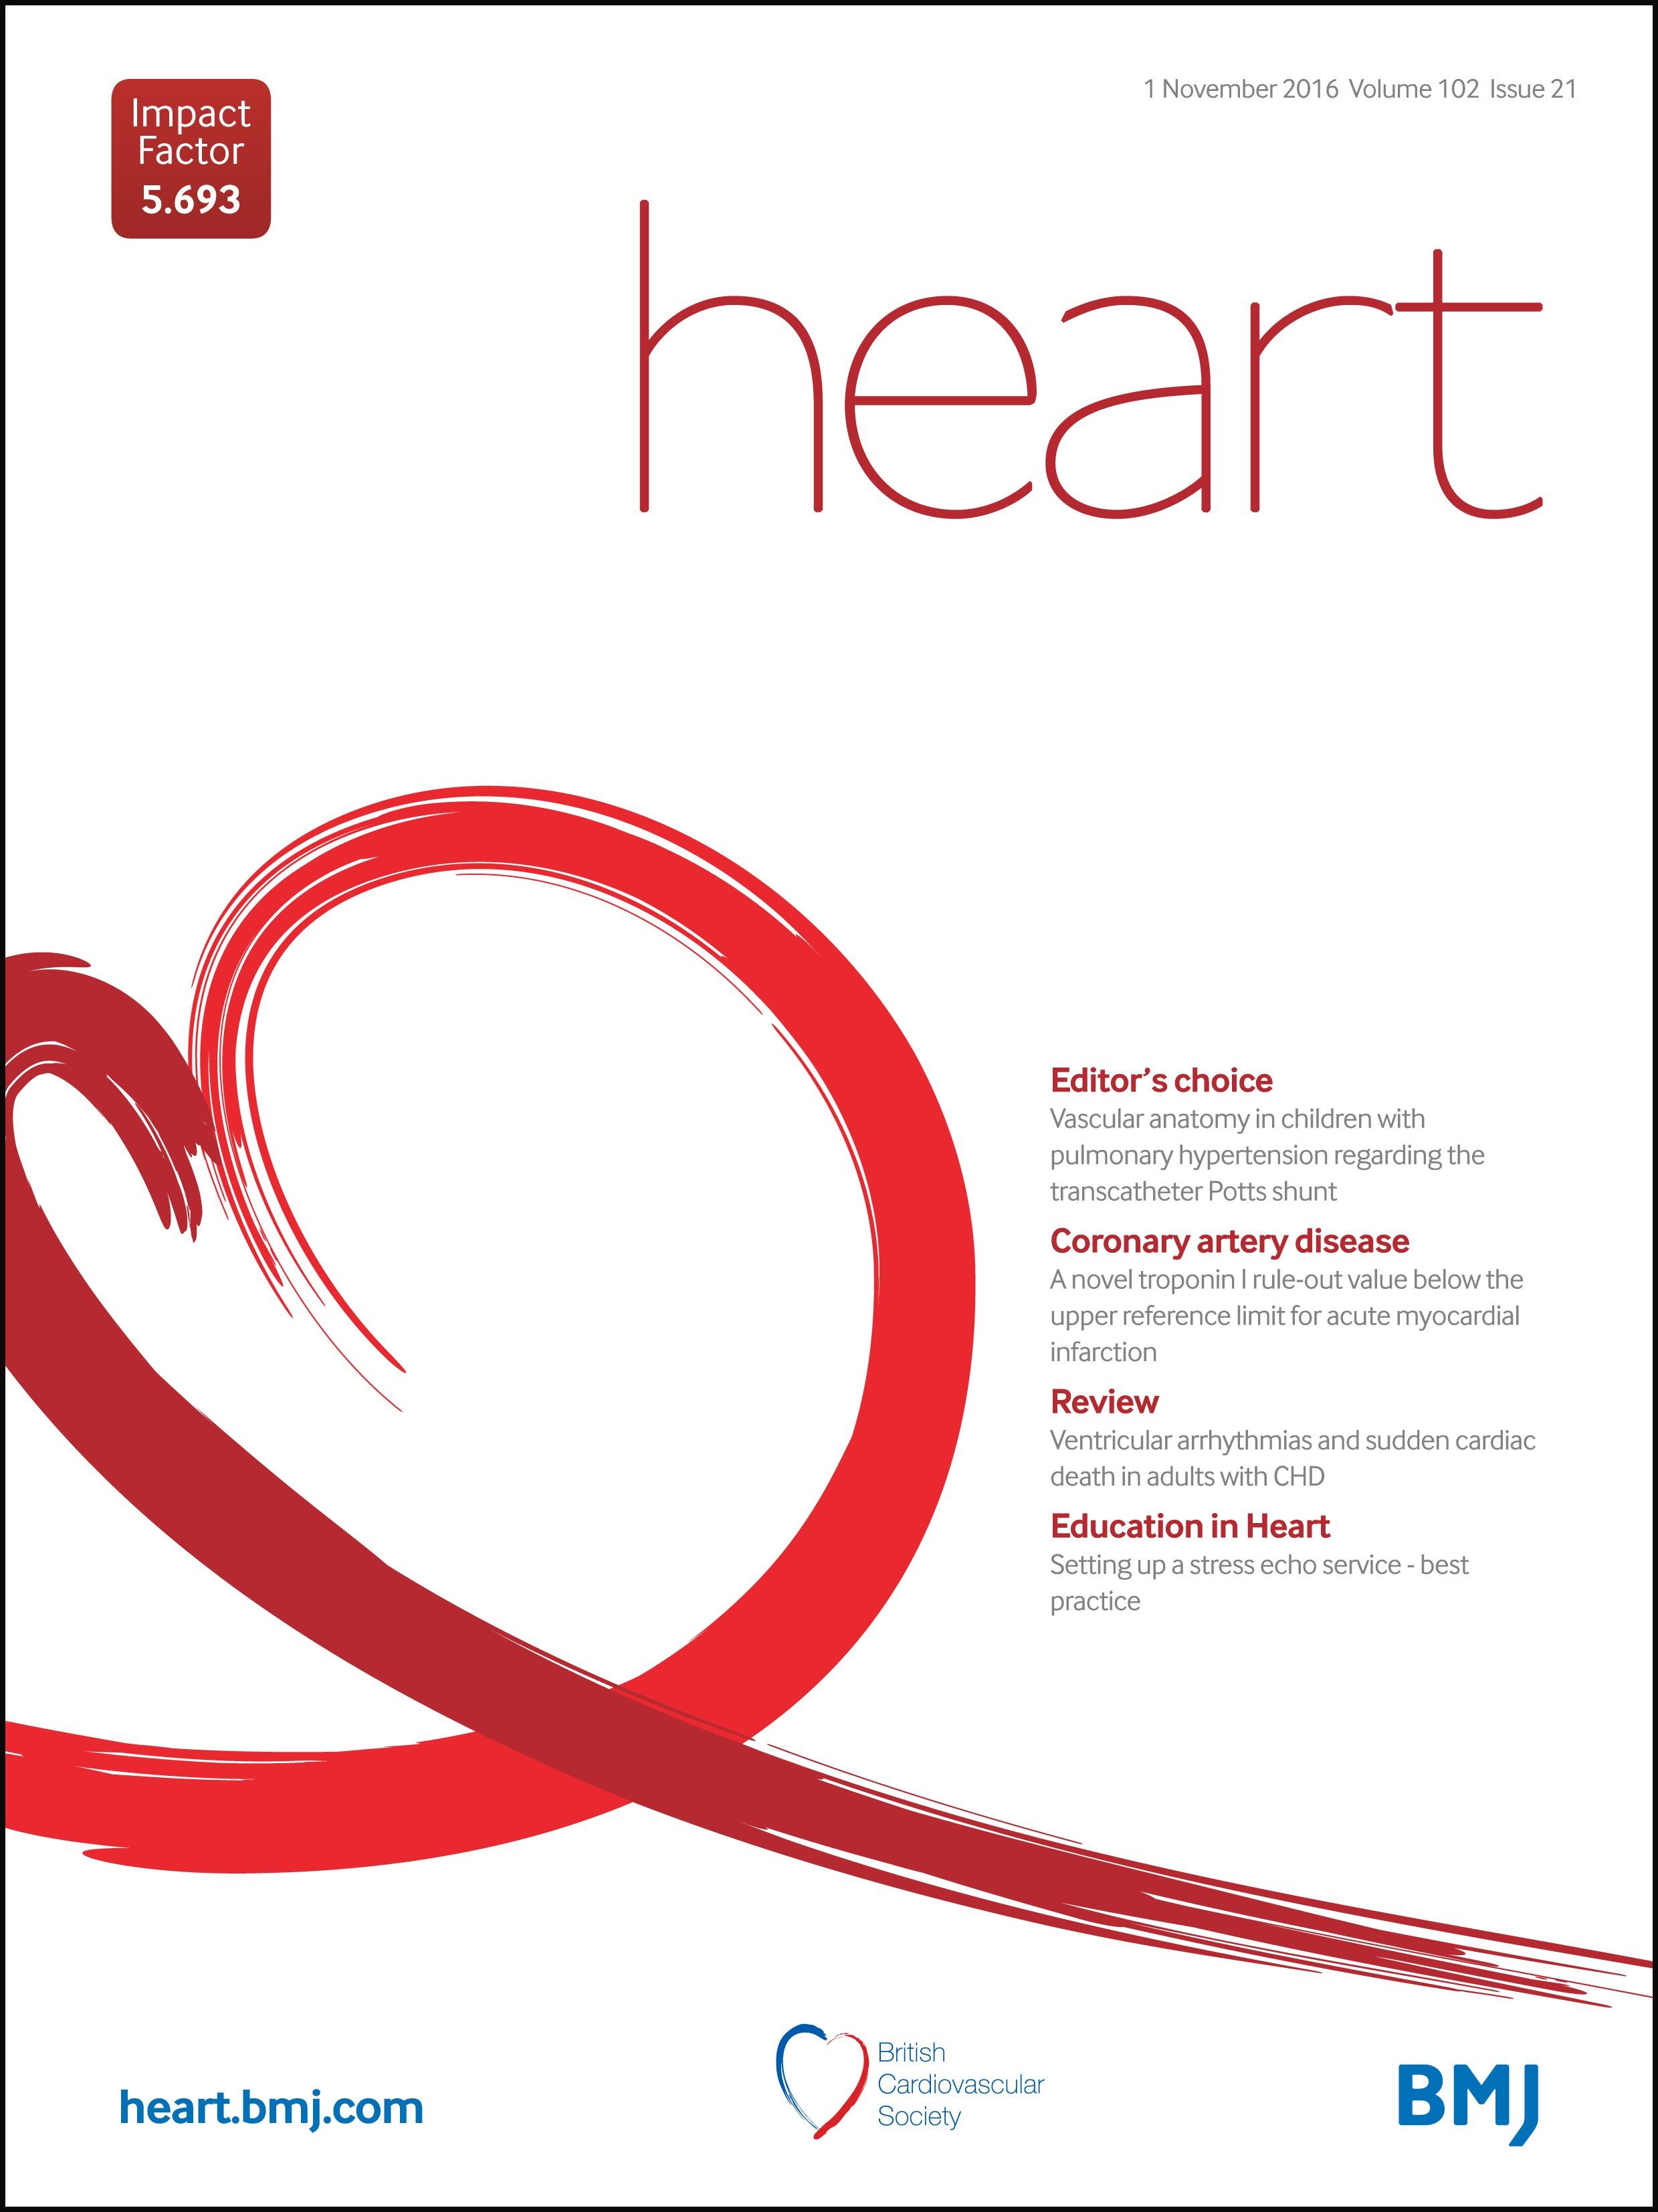 Heartbeat: Imaging complex vascular anatomy in congenital heart ...